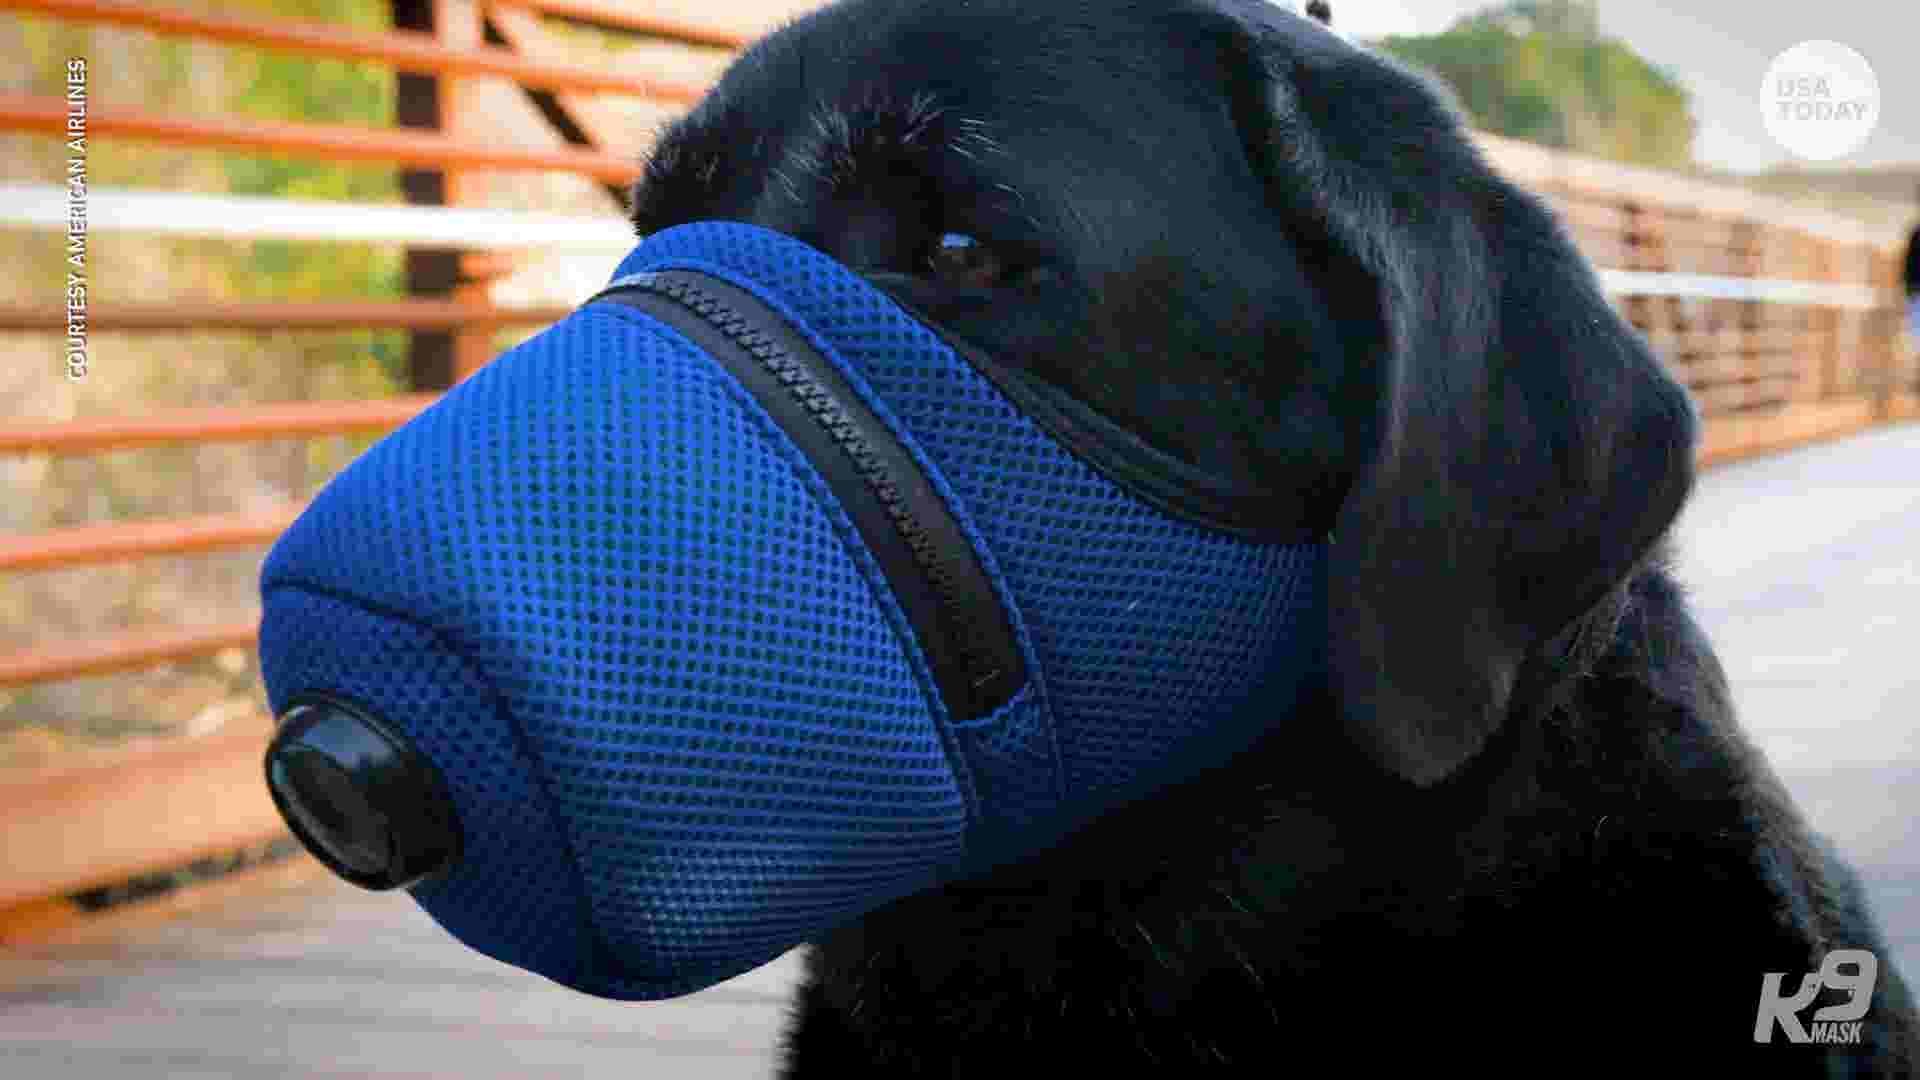 Coronavirus: Dog face masks flying off the shelves in wake of growing outbreak